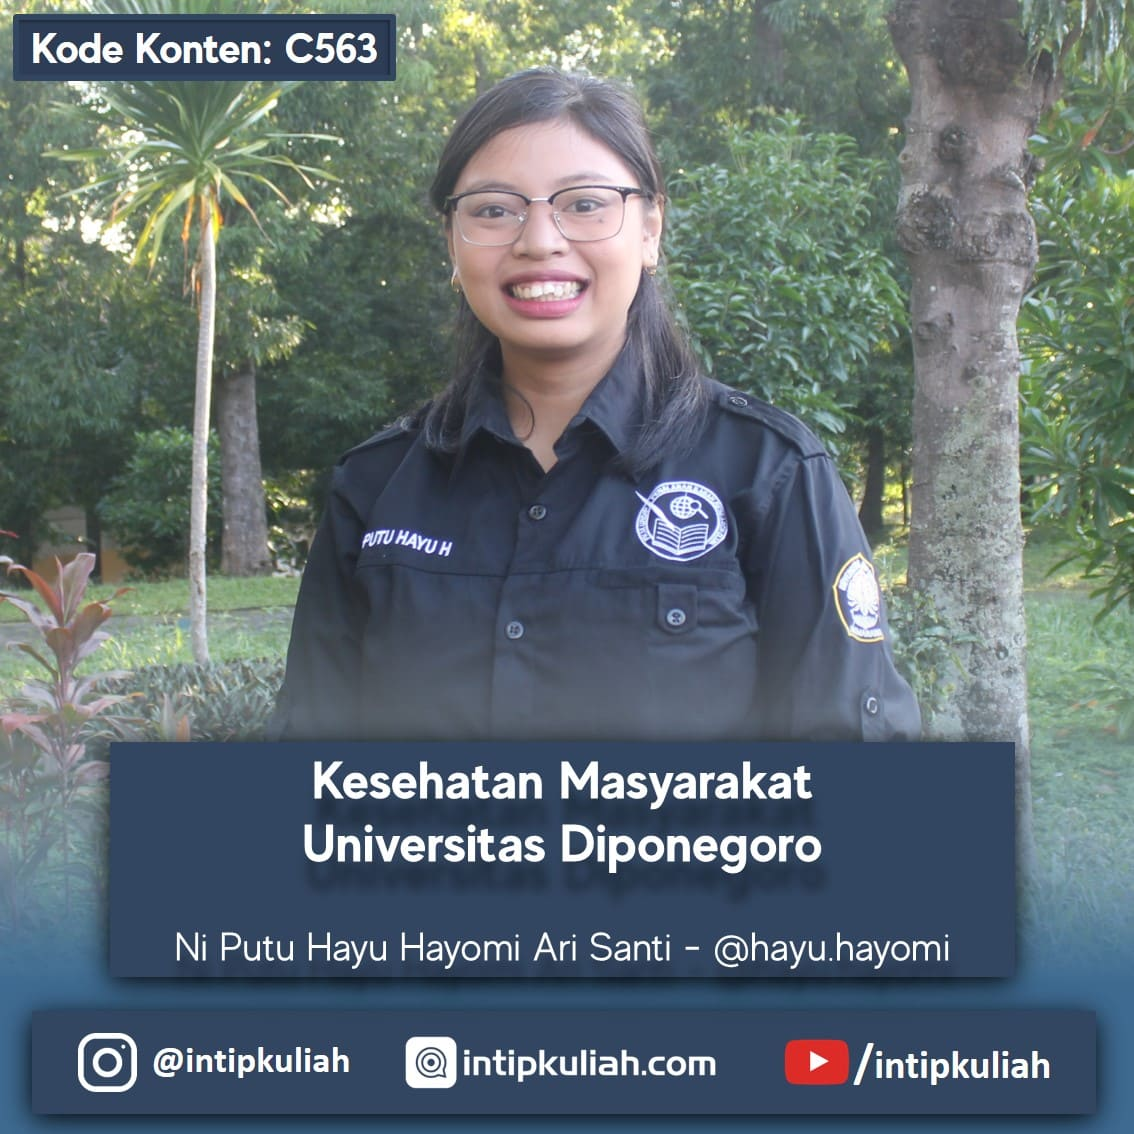 Kesehatan Masyarakat Universitas Diponegoro (Putu)